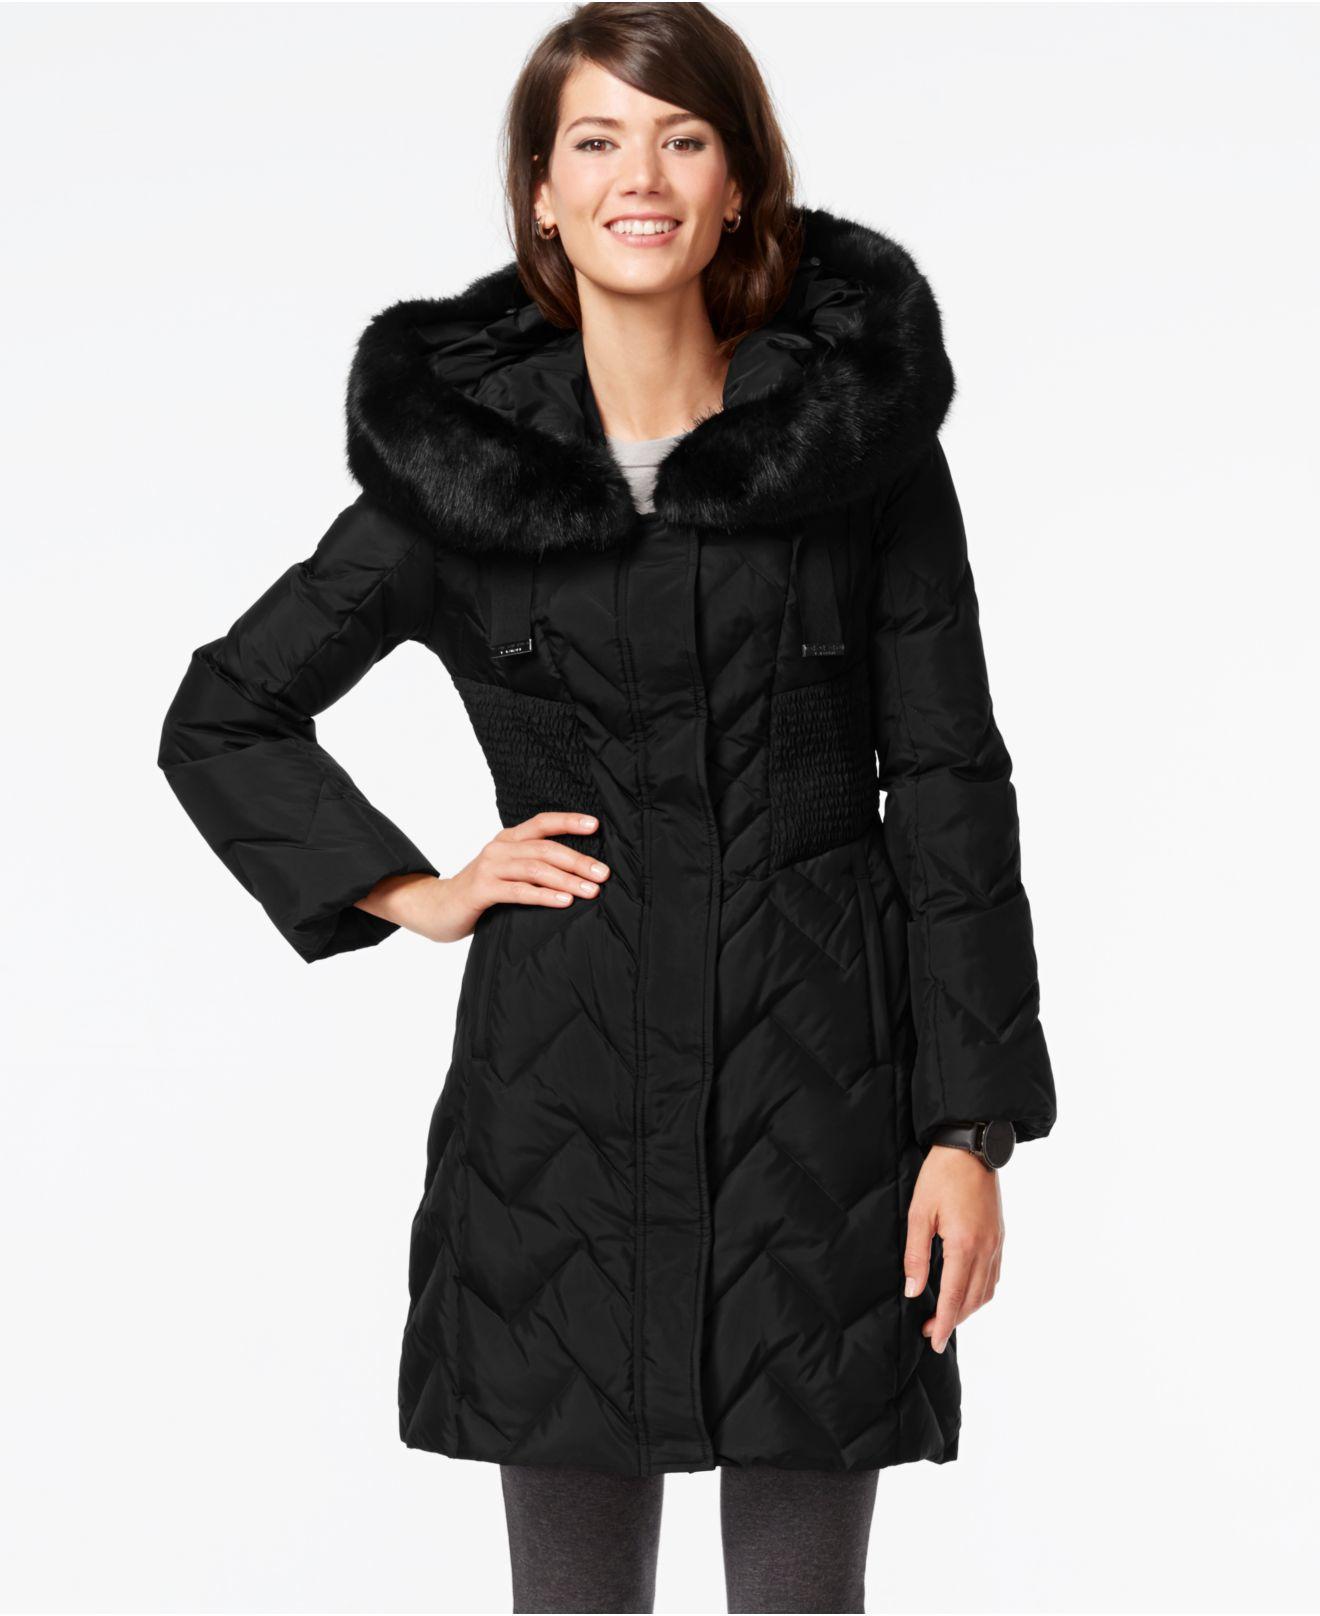 Lyst Tahari Faux Fur Trim Hooded Down Coat In Black